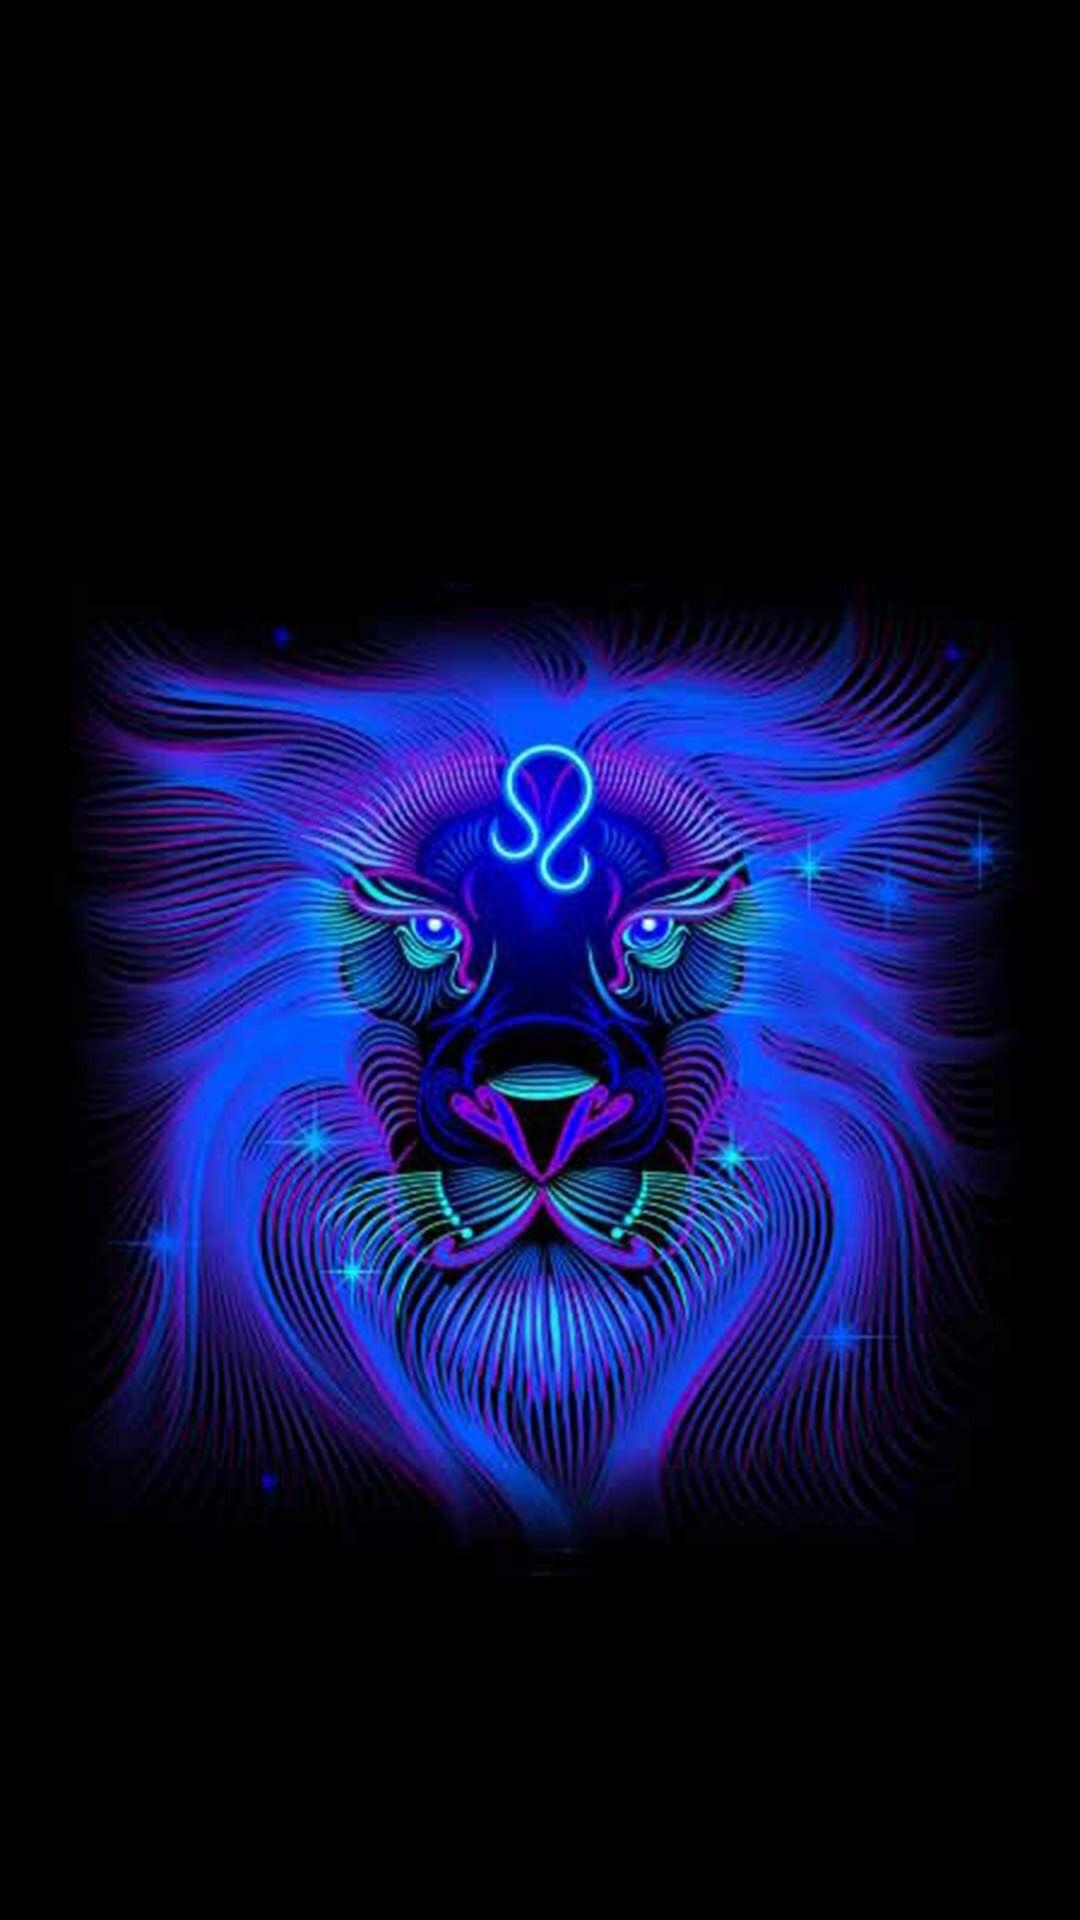 Pin By Lynn Hays On Wallpapers Leo Zodiac Aquarius Constellation Tattoo Zodiac